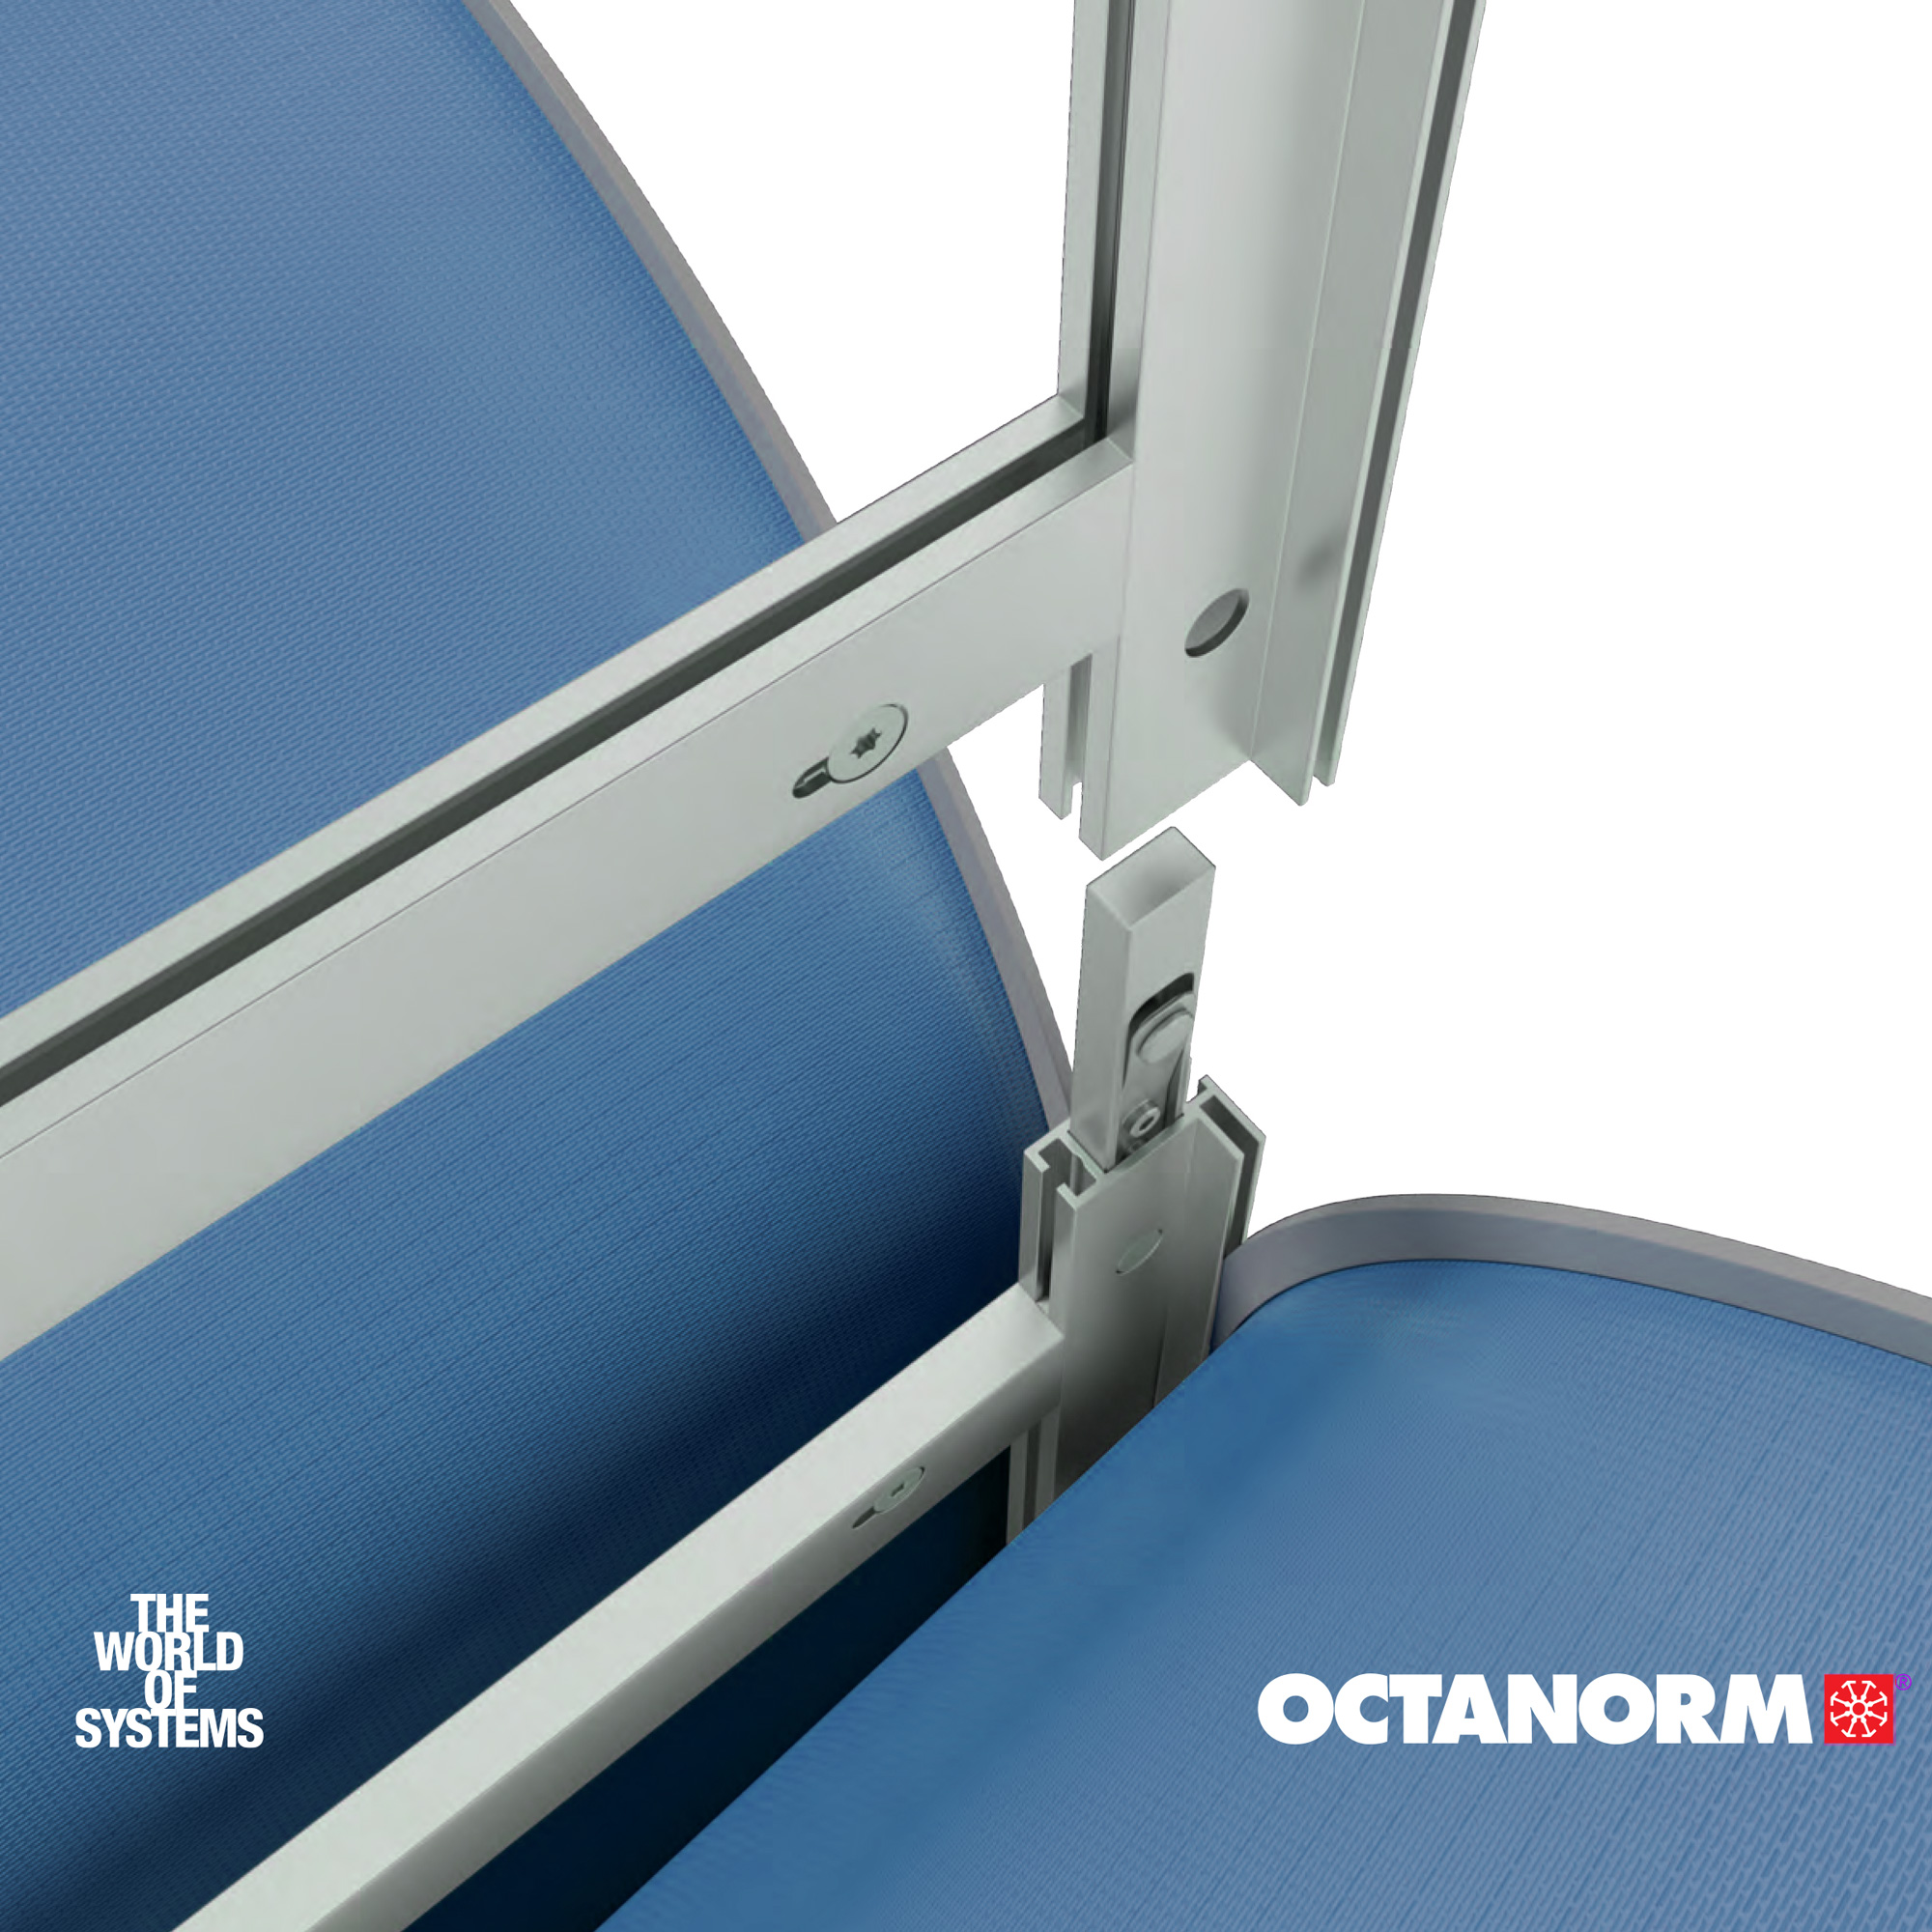 Octanorm Display Solutions headline image